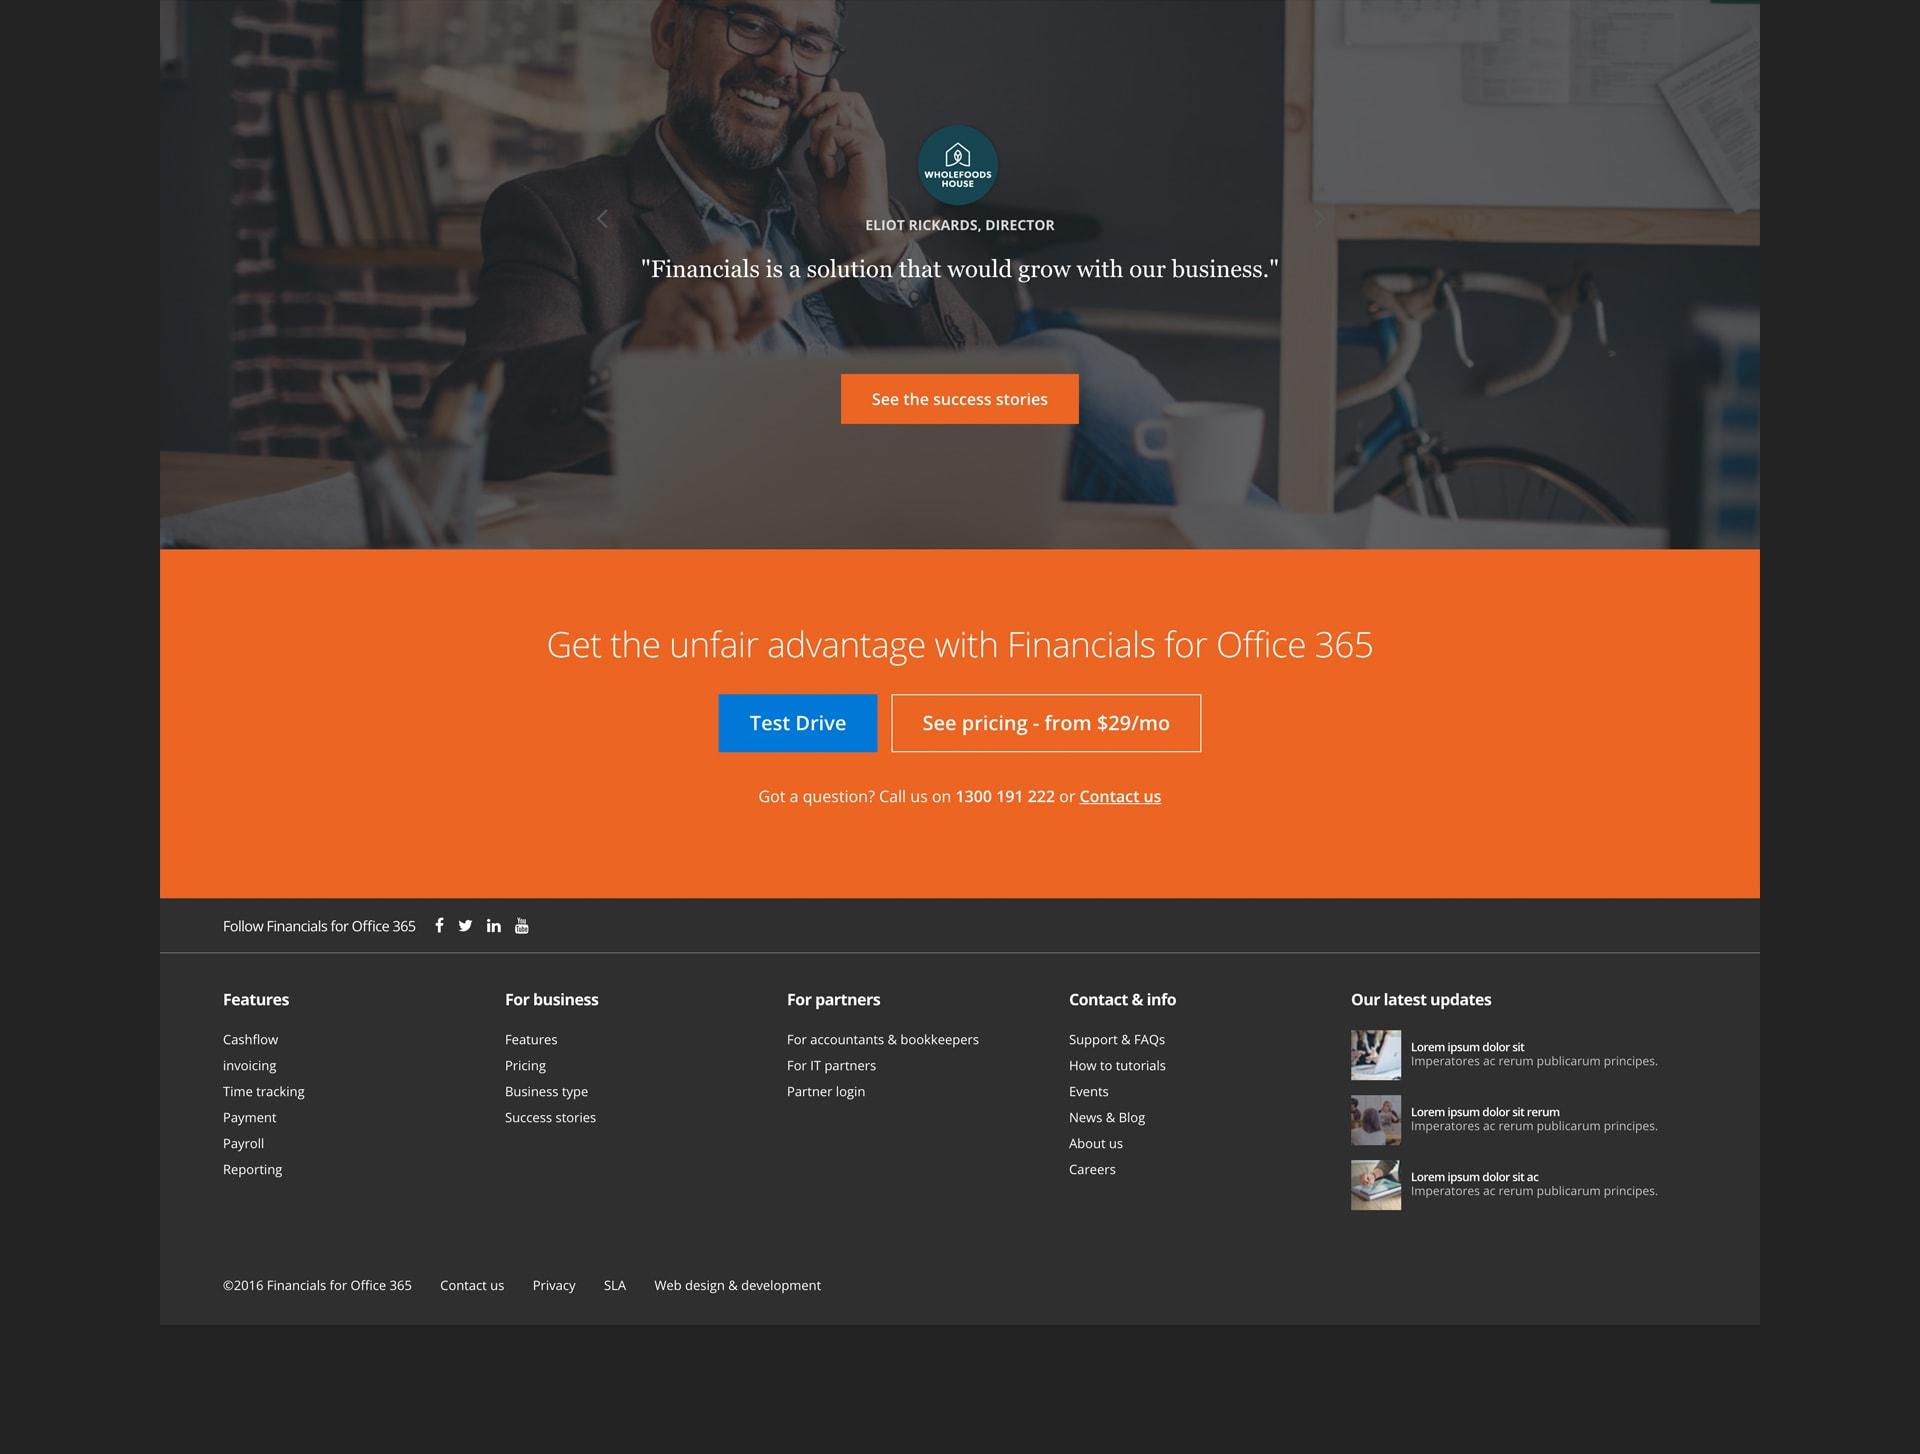 web design and development company mockups